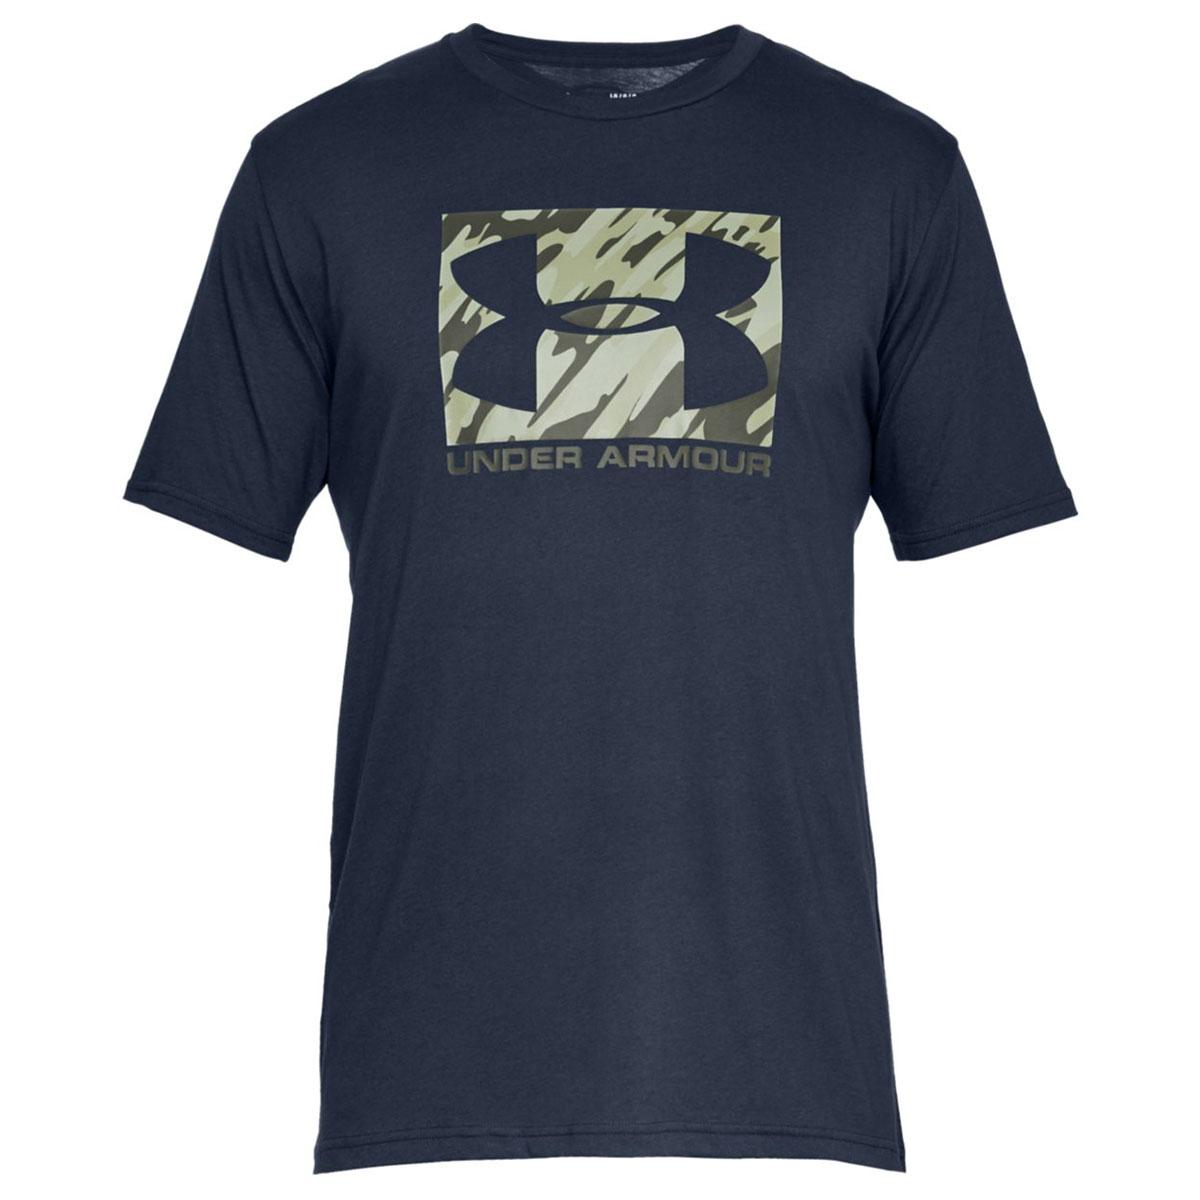 Under-Armour-Mens-2019-UA-Boxed-Sportstyle-HeatGear-Training-Gym-T-Shirt-Tee thumbnail 4